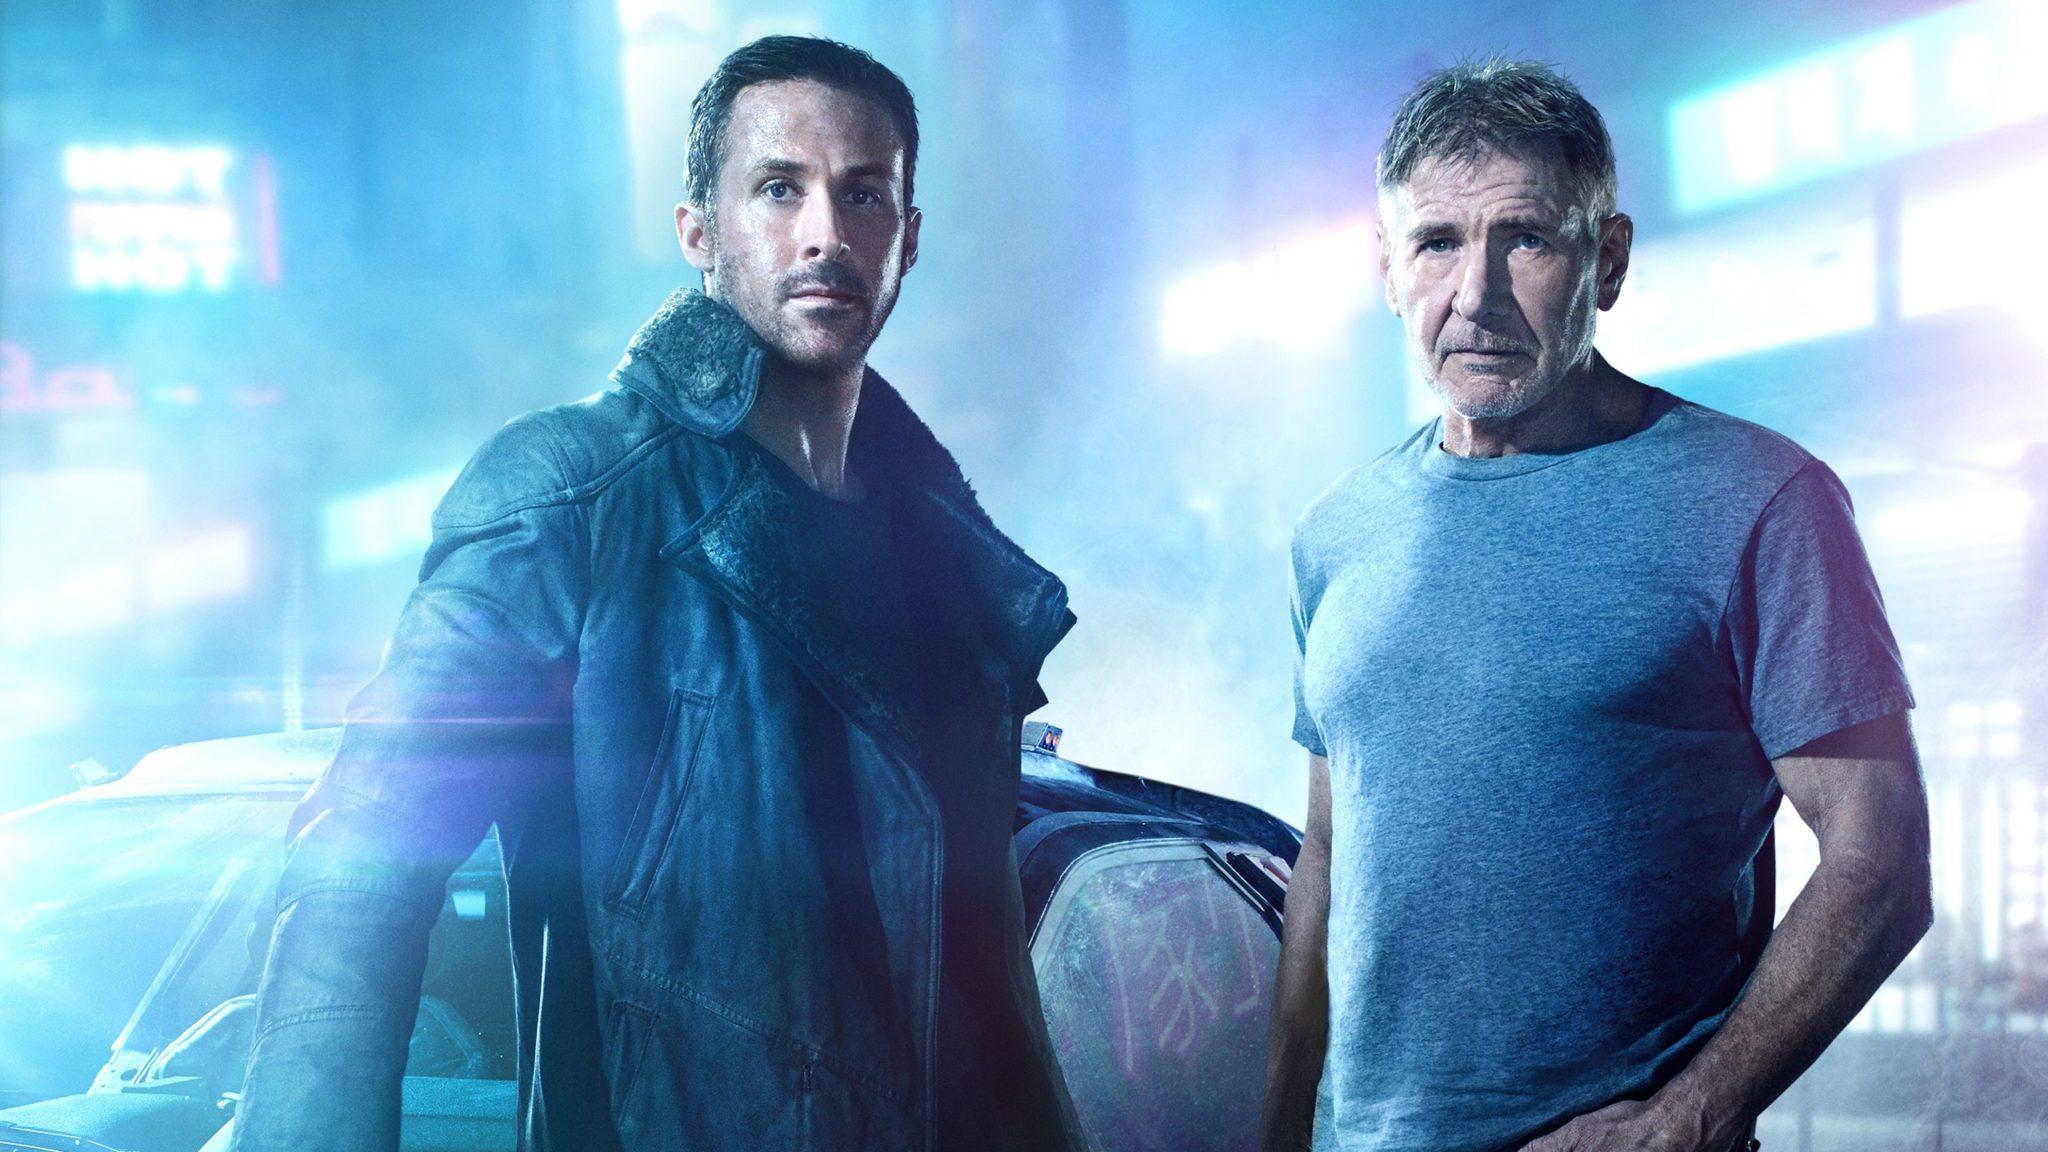 Novo trailer dá detalhes de Blade Runner 2049